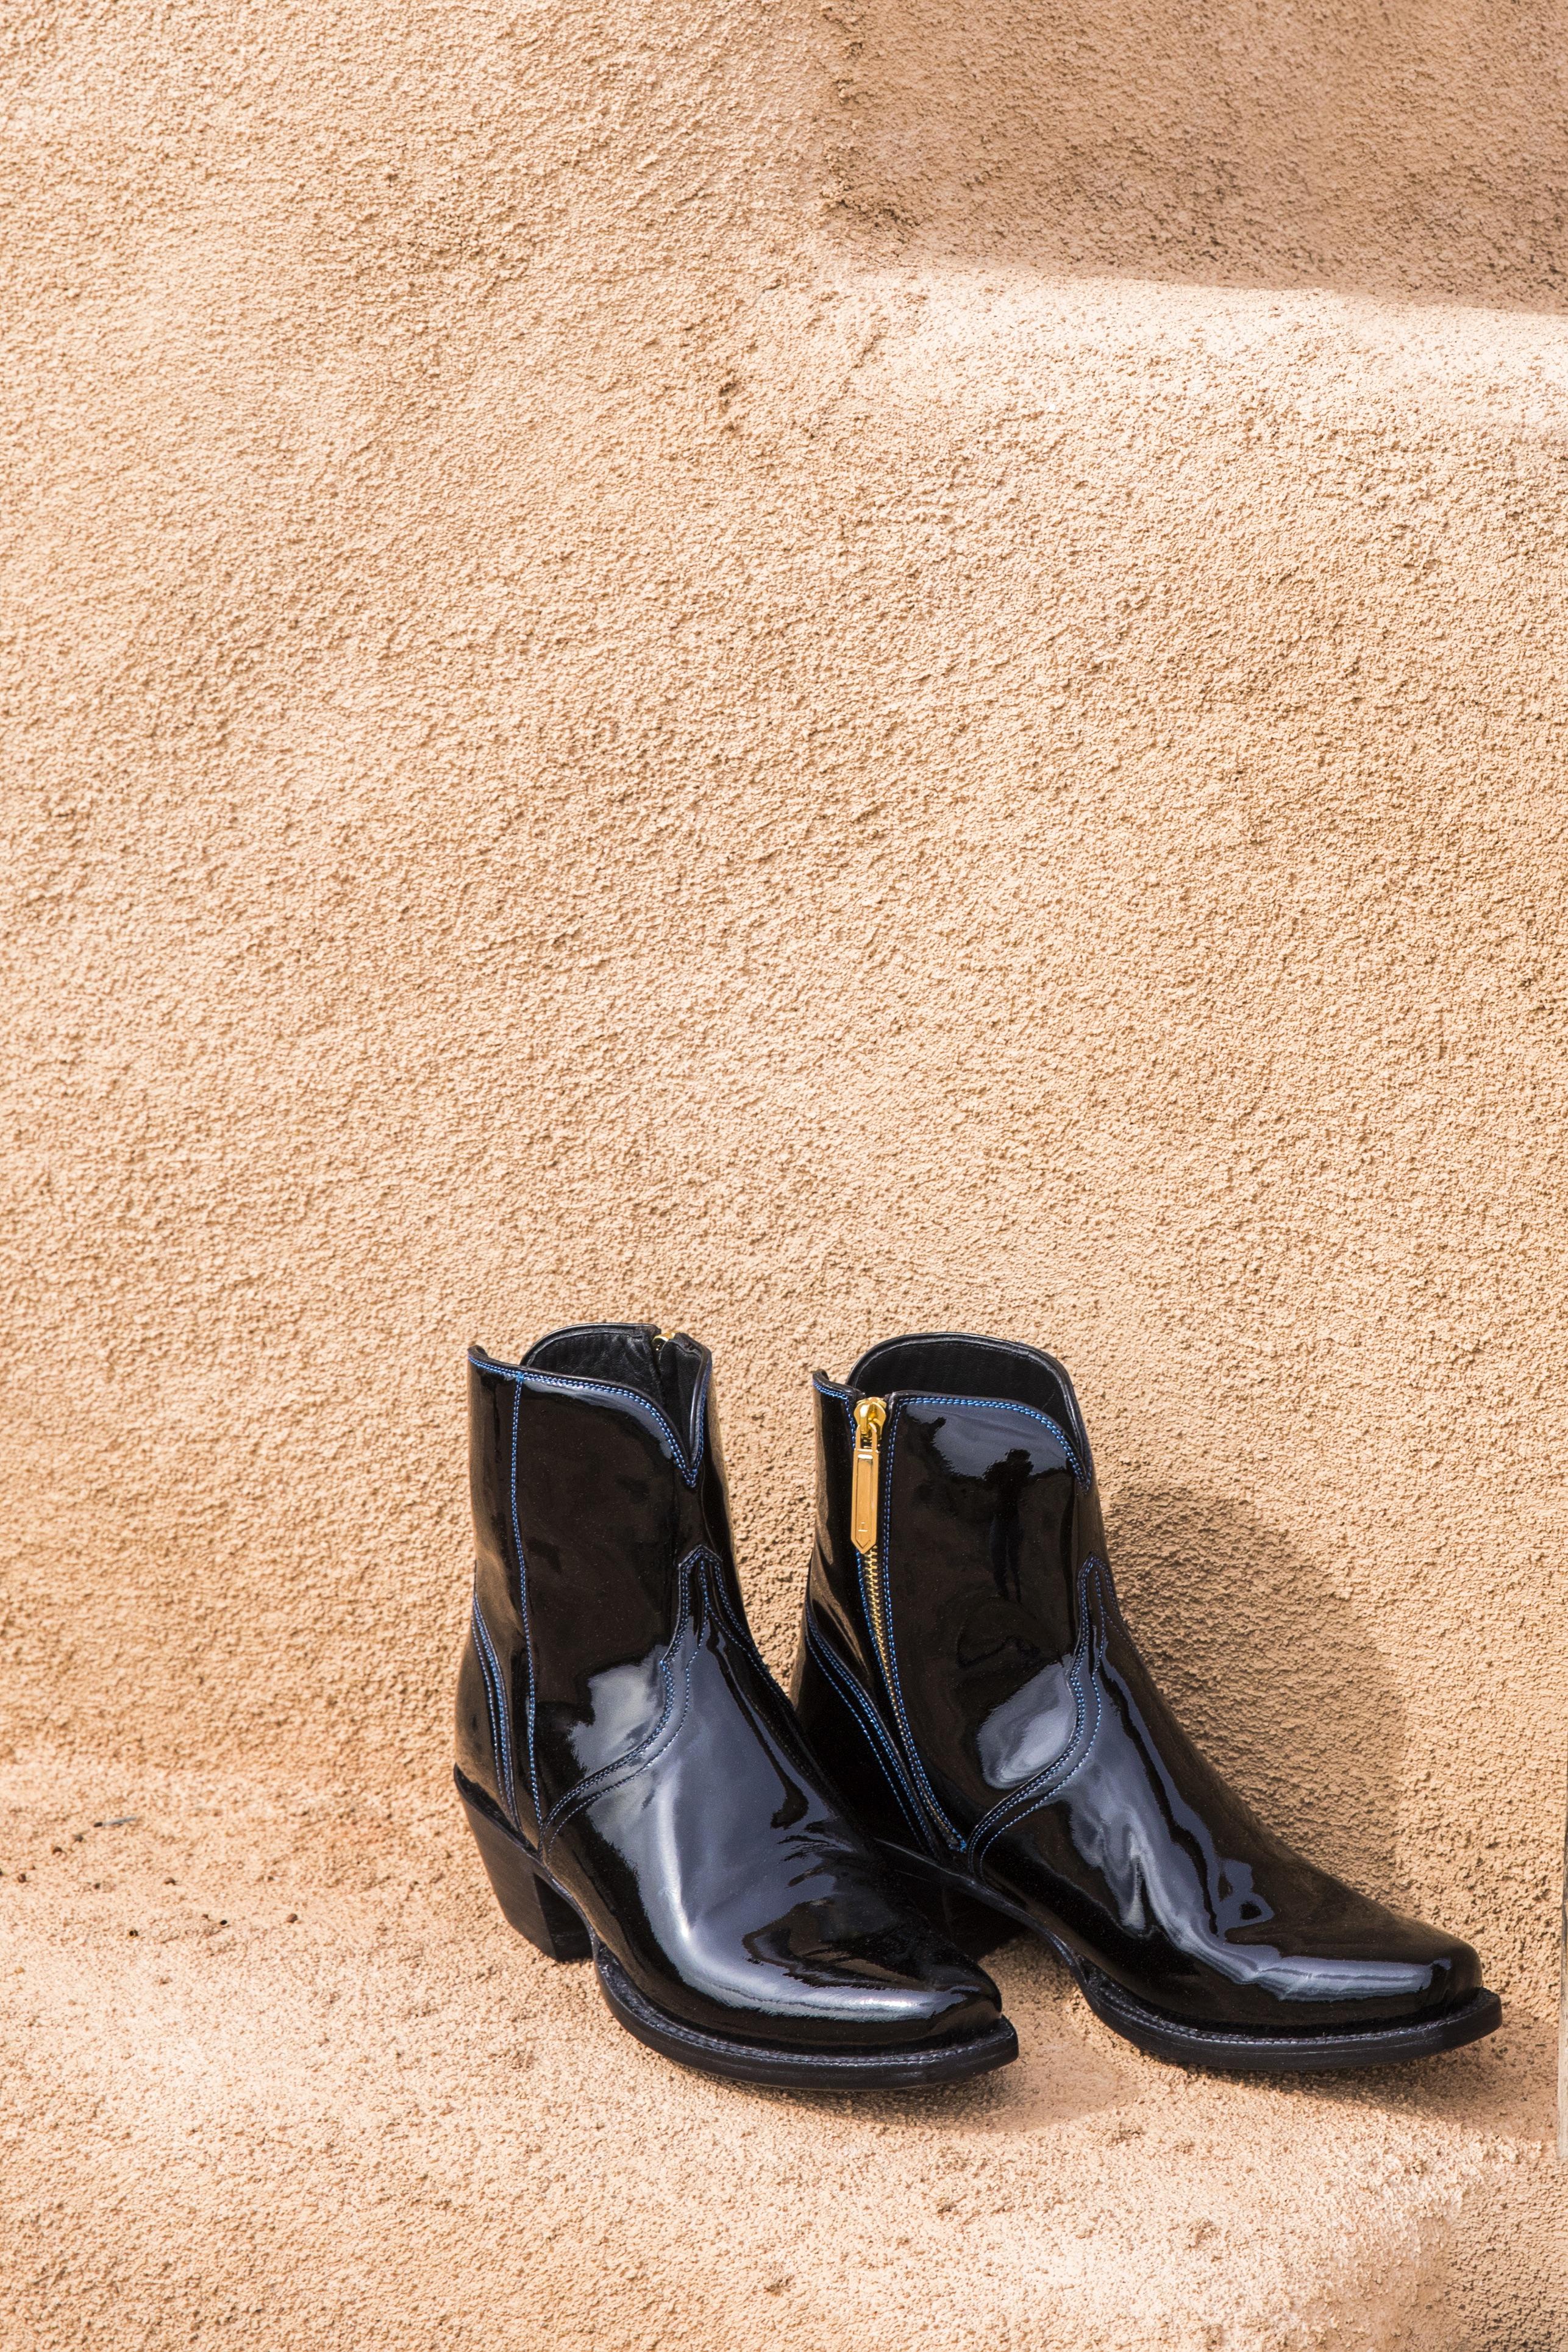 Erin Wasson Lucchese cowboy boots